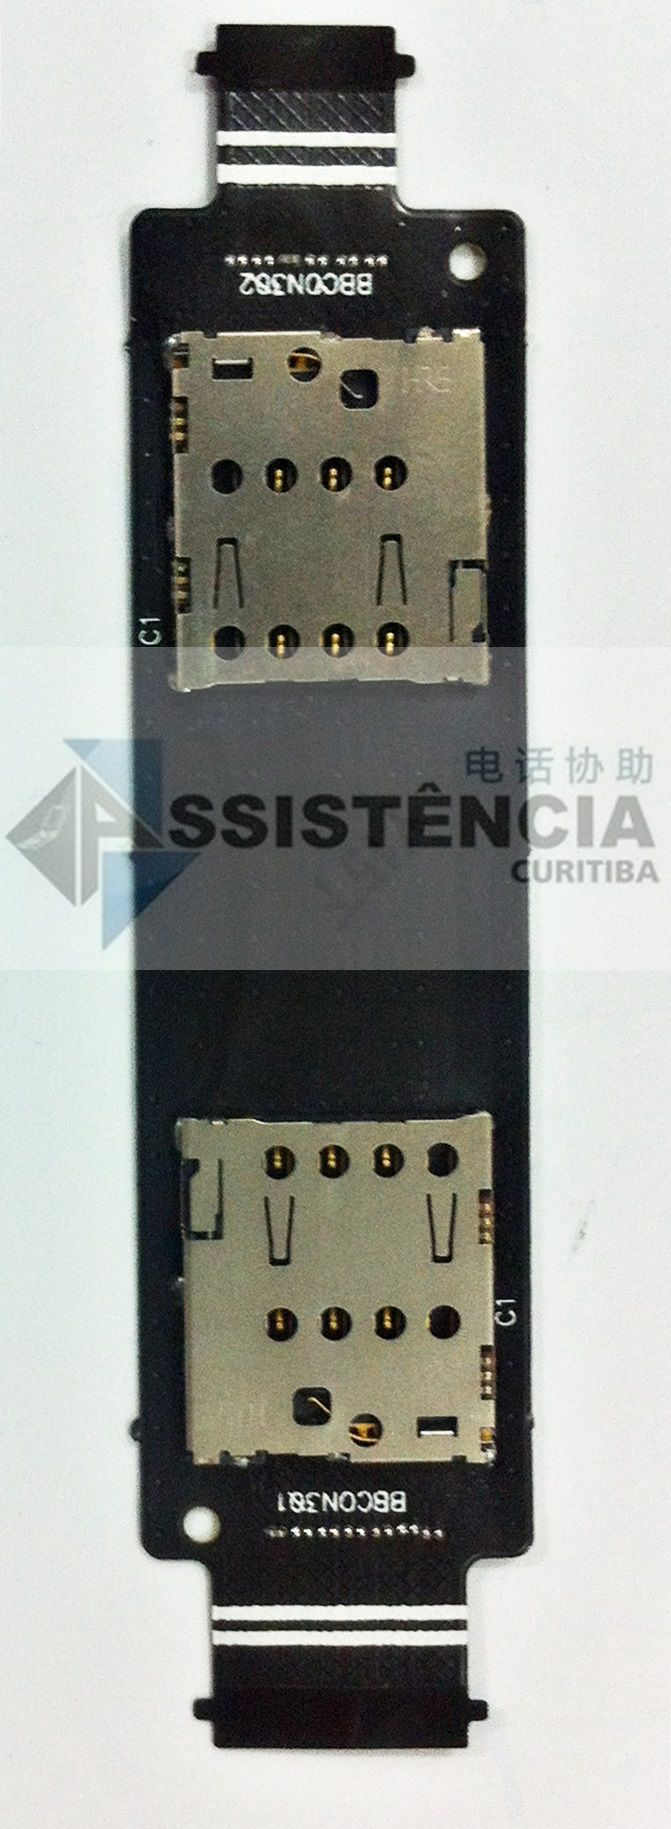 CONECTOR DO CHIP SIM CARD SLOT ASUS ZENFONE 5 A501